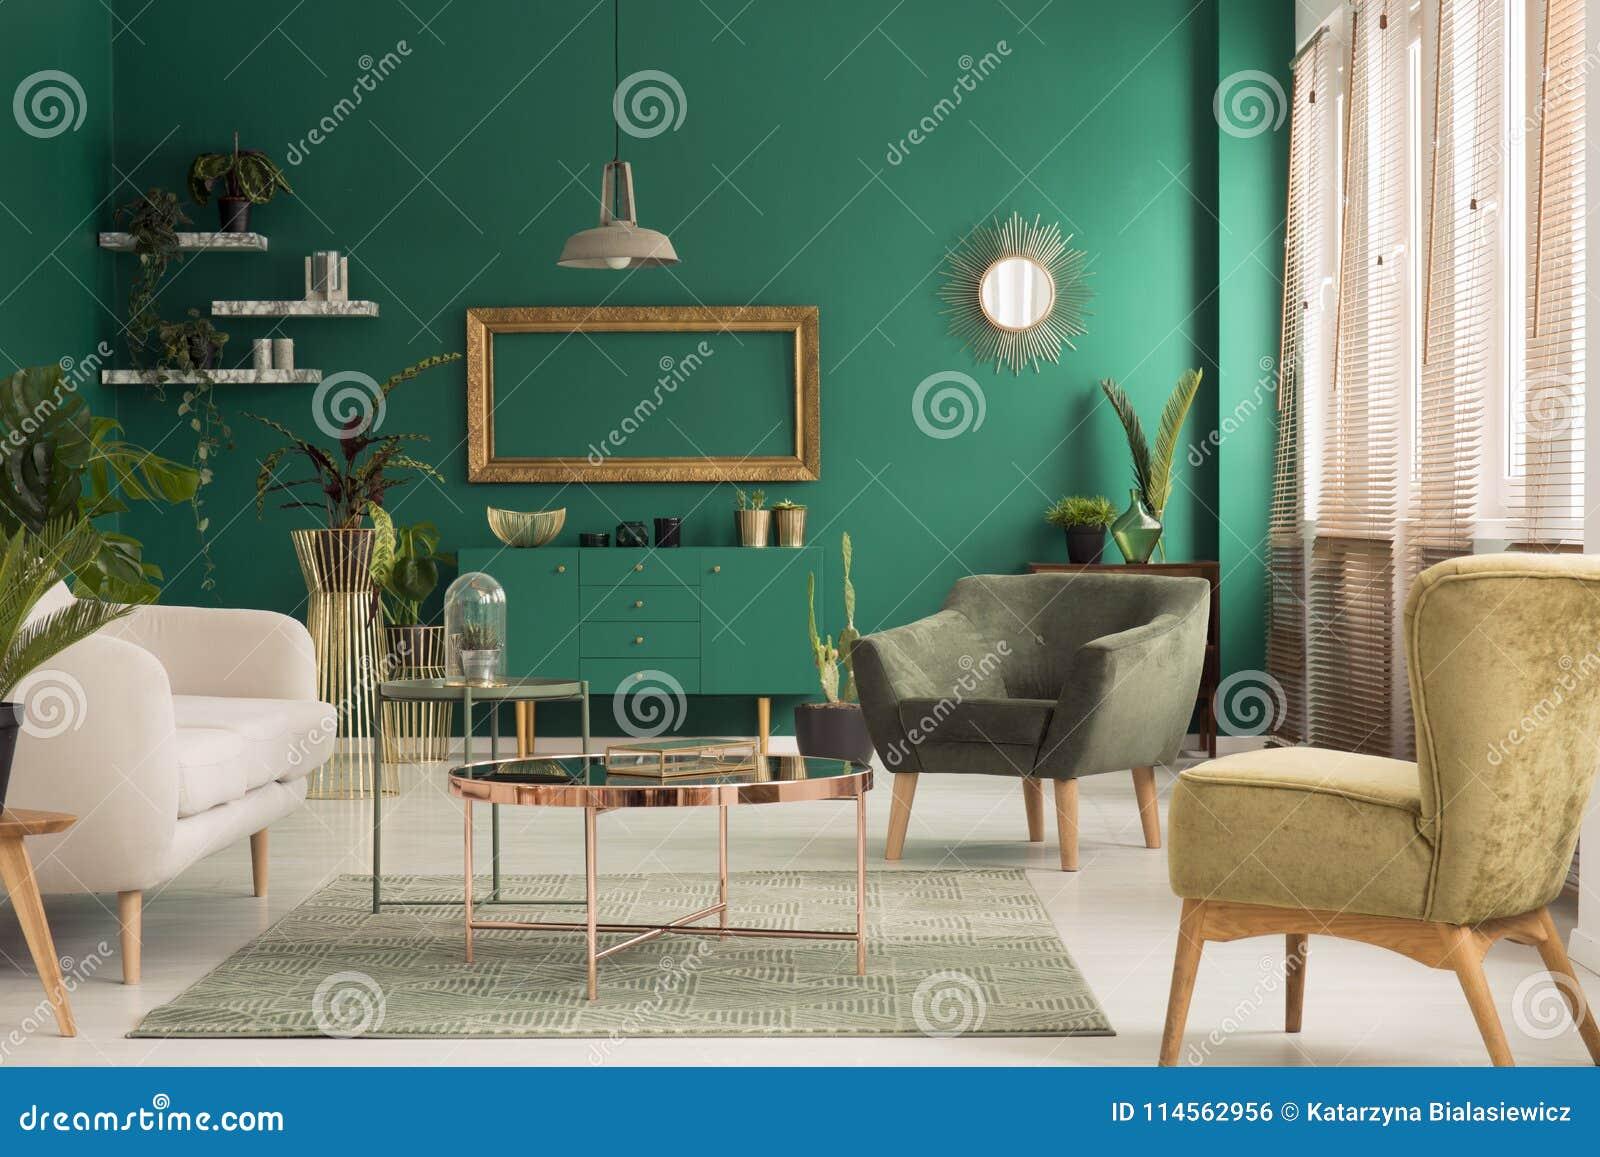 Groene Accessoires Woonkamer : Muur accessoires woonkamer top groene accessoires woonkamer with